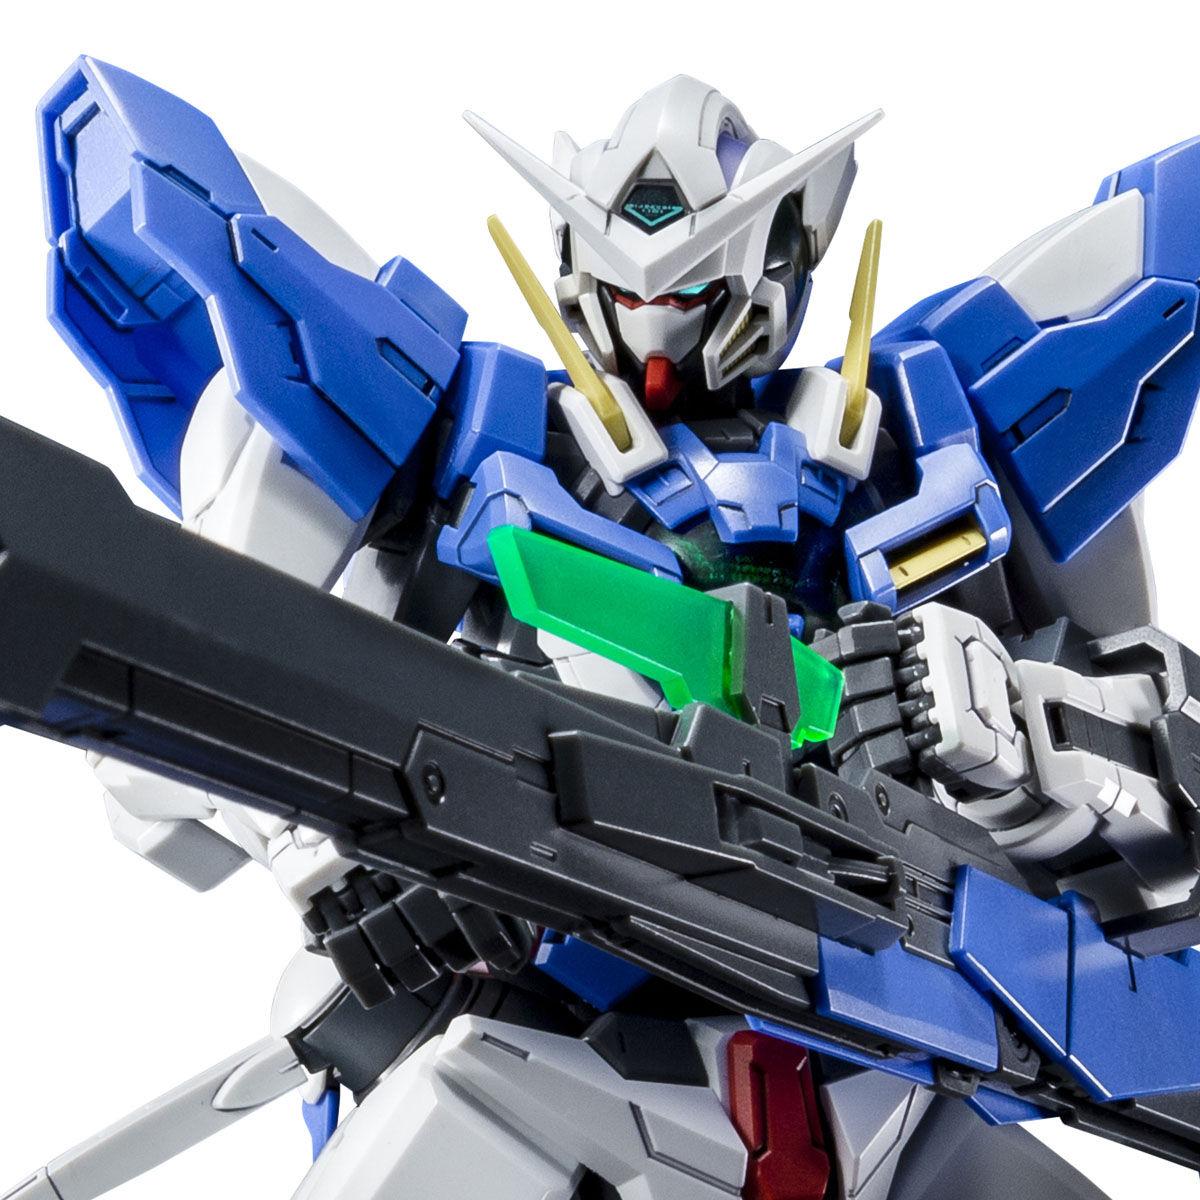 MG 1/100 GUNDAM EXIA REPAIR Ⅲ